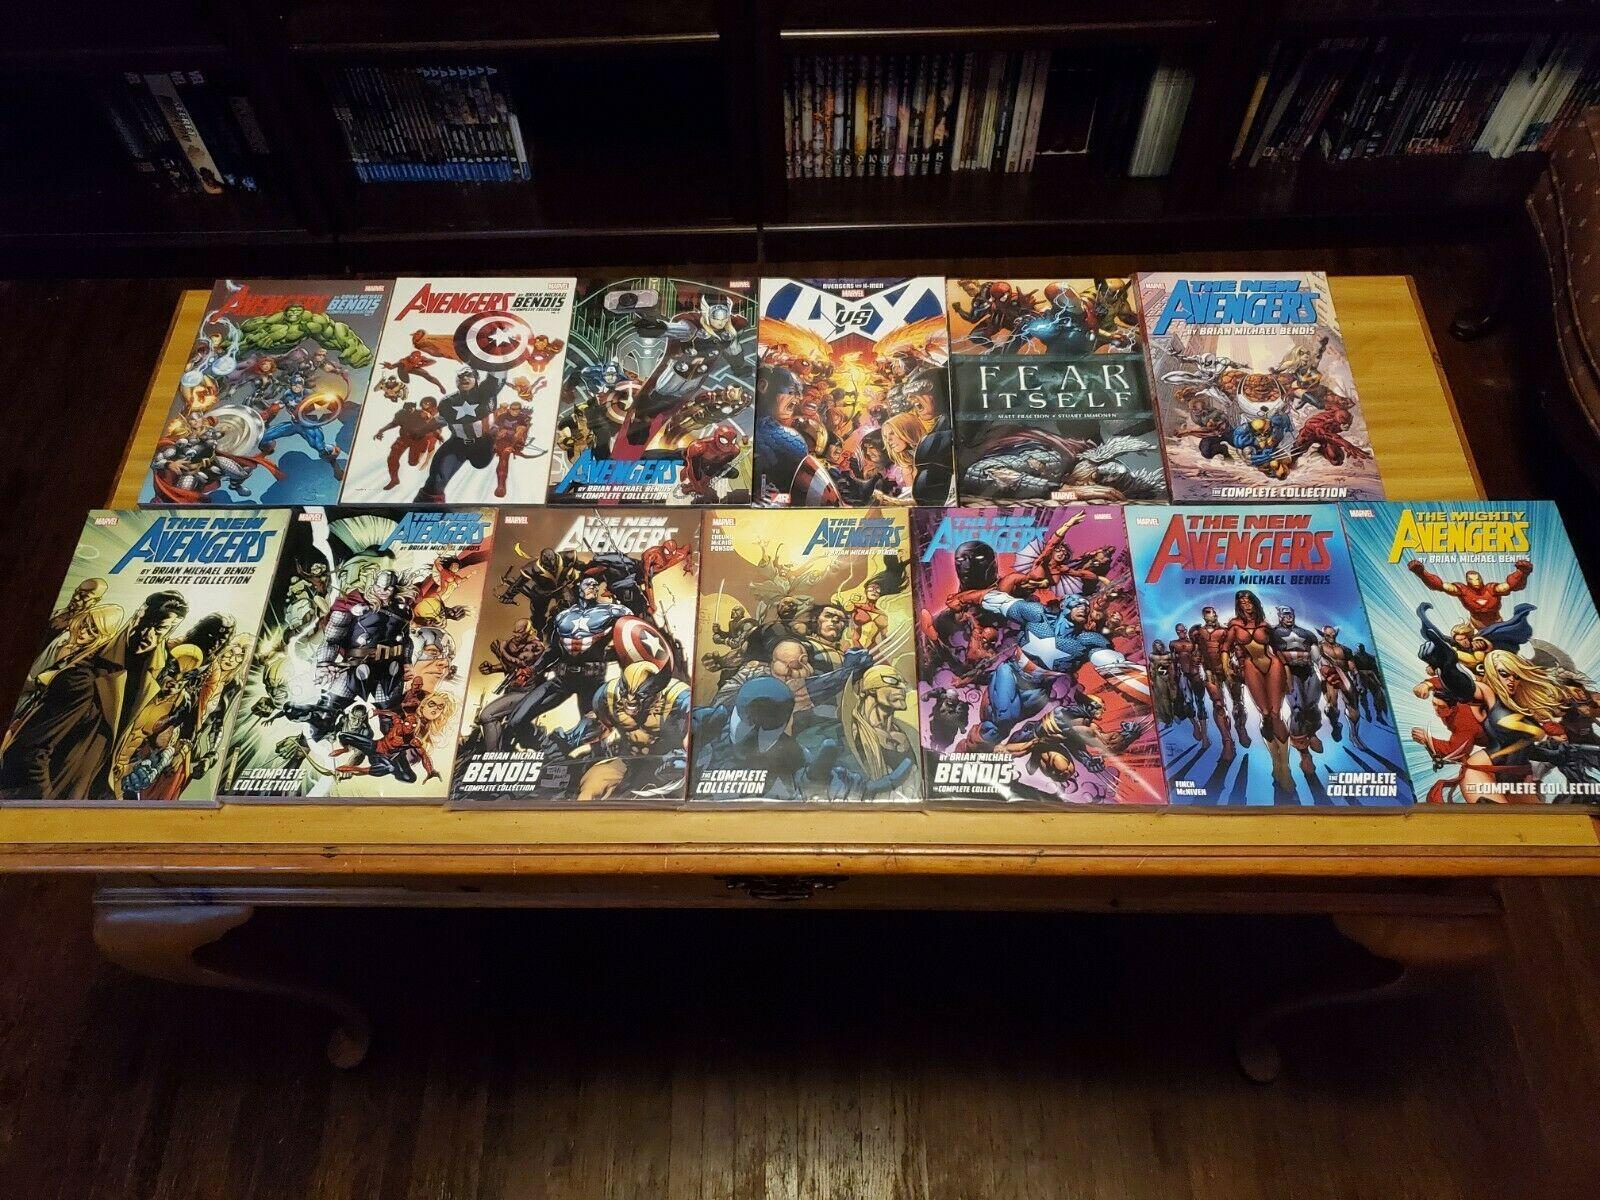 New Avengers - Mighty Avengers - Avengers + Tie In Books - 13 TPB - Bendis